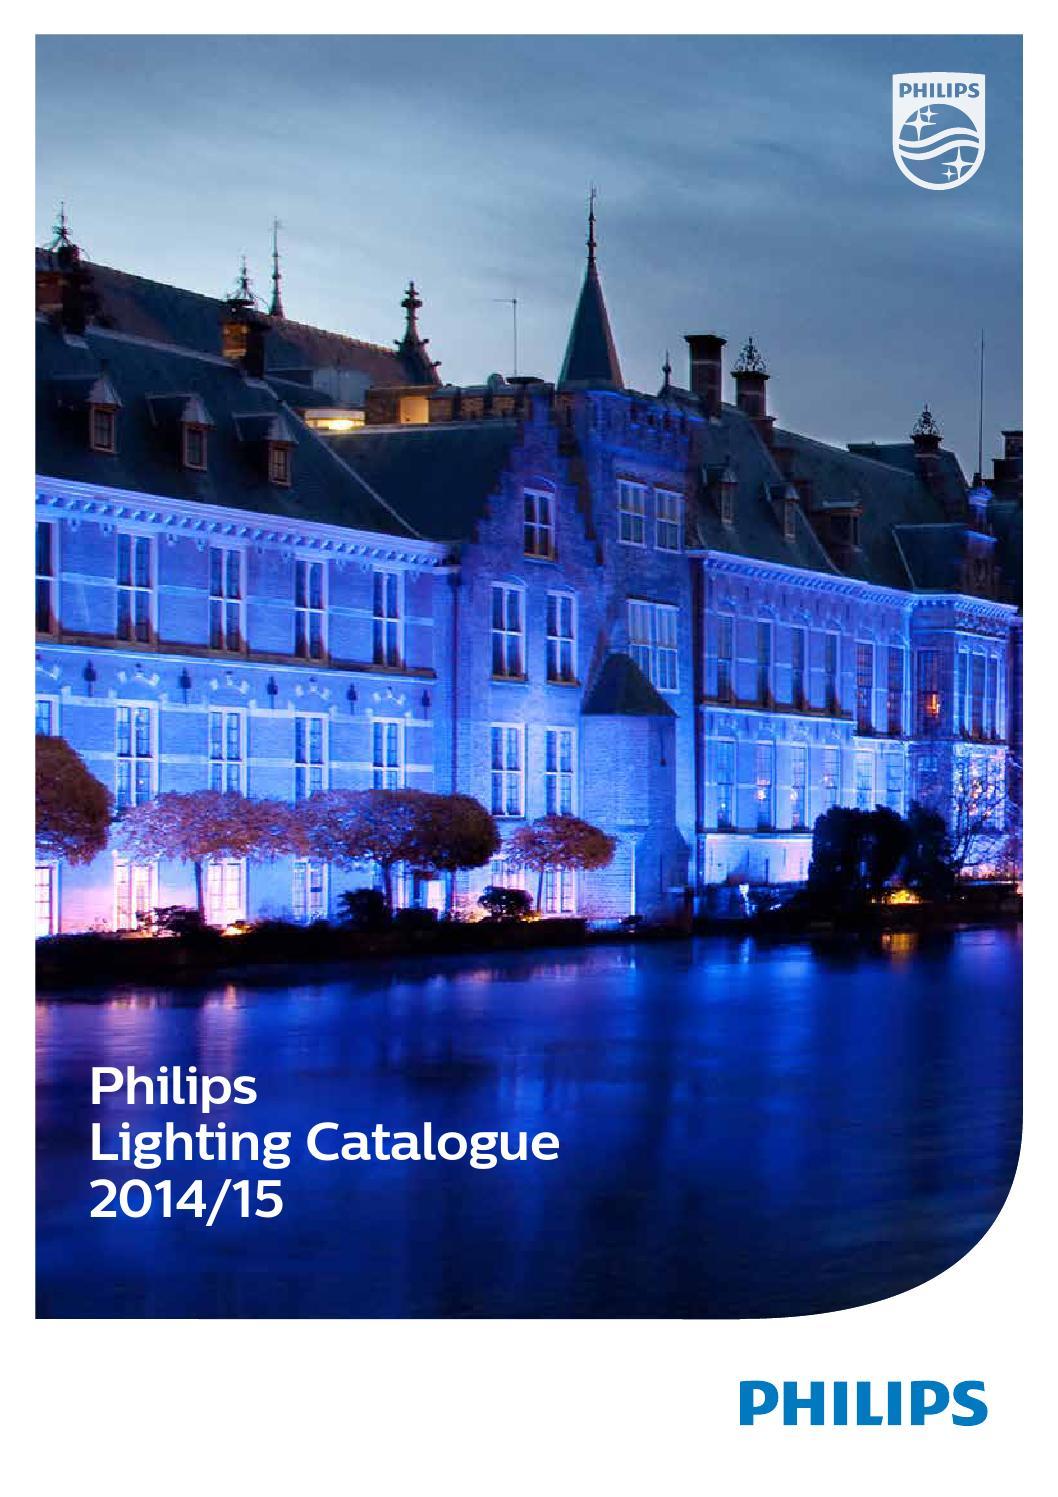 philips lighting catalogue 2014 final